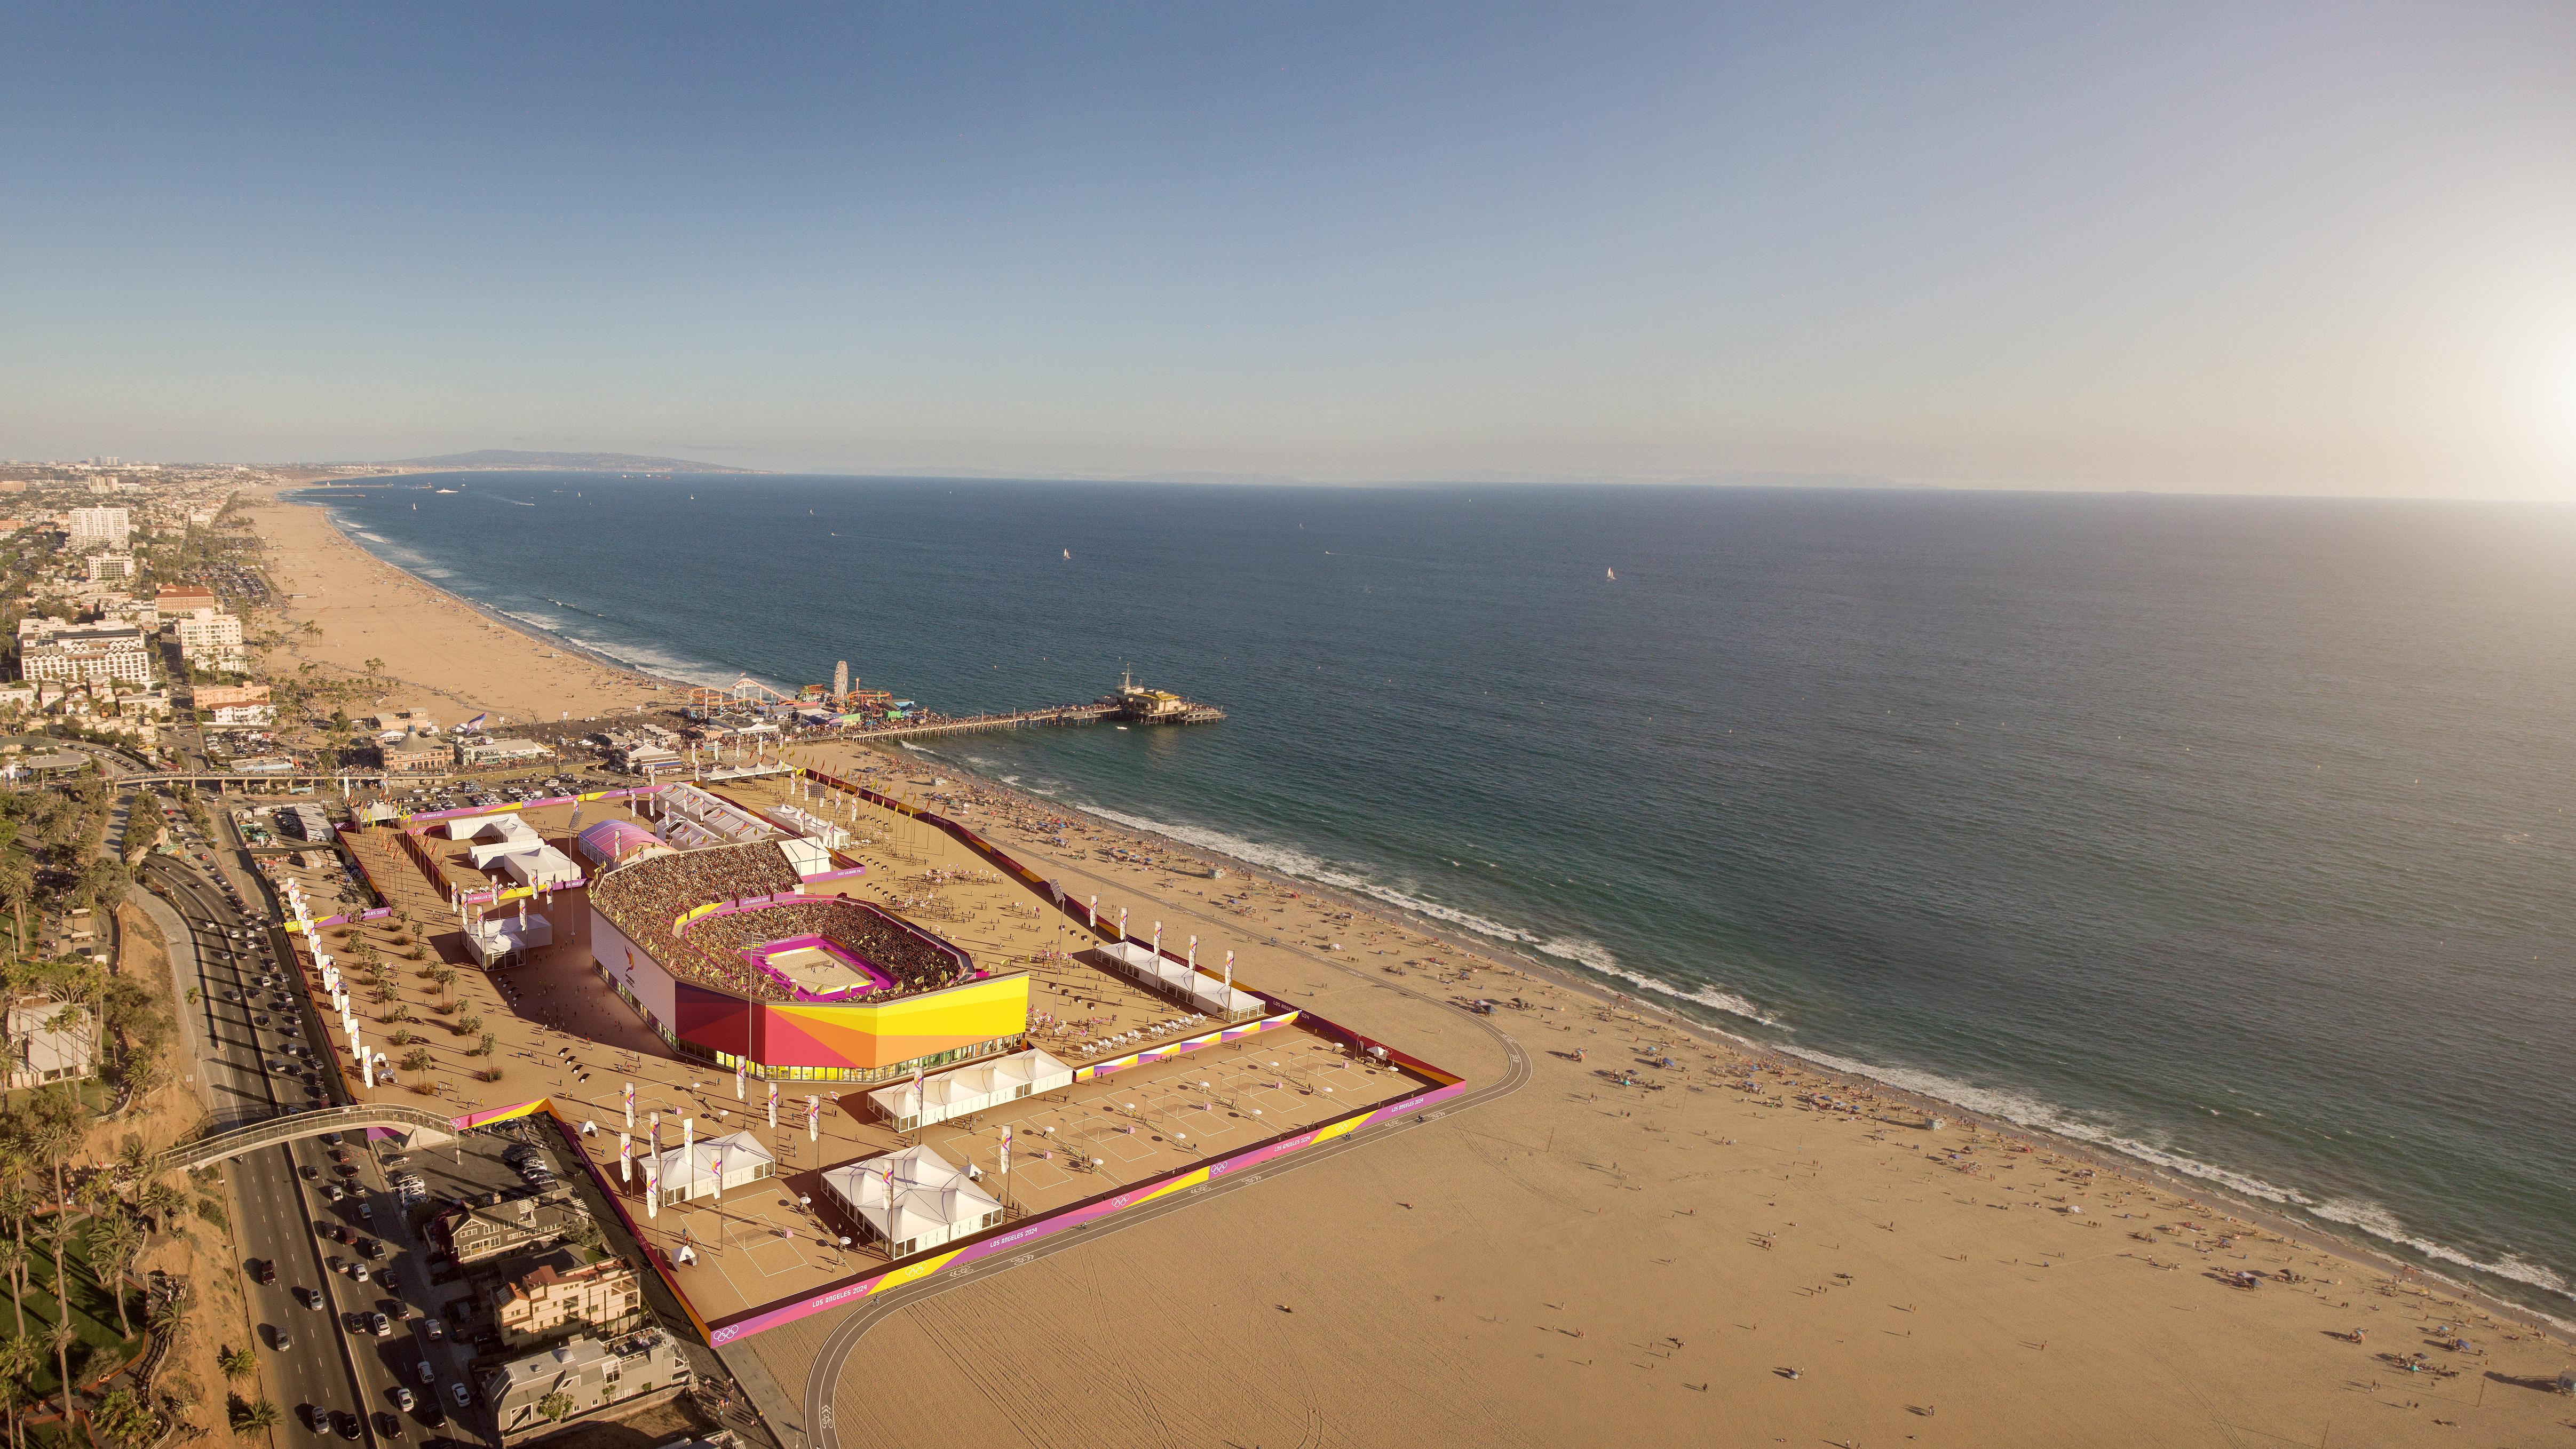 Temporary beach volleyball stadium